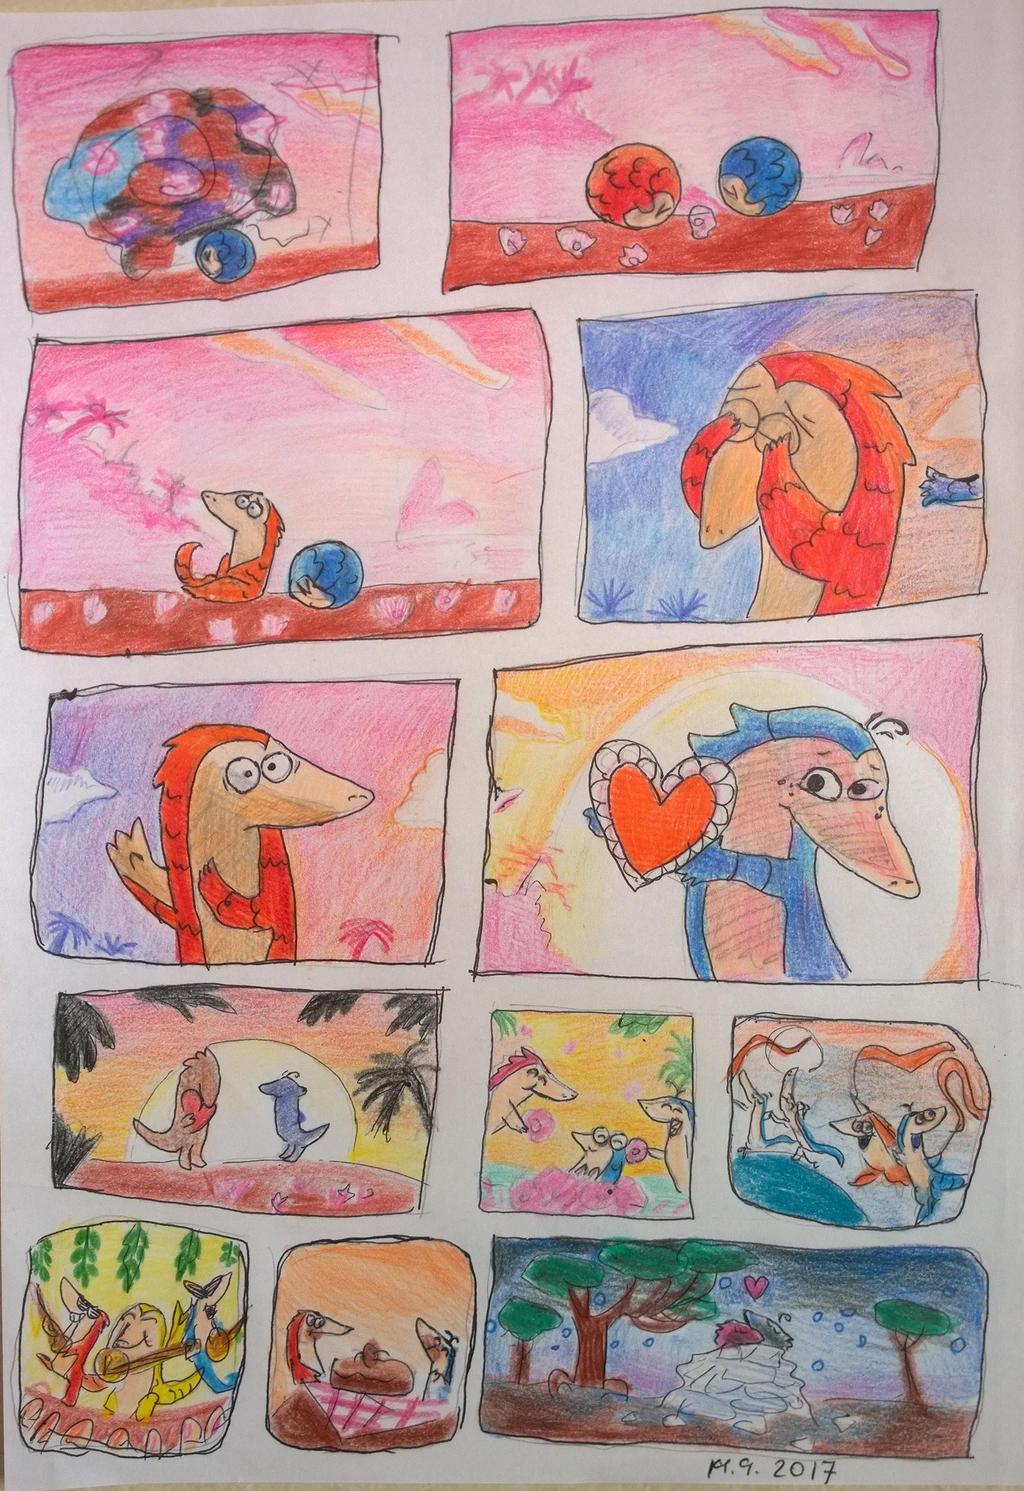 pangolin love day - the end. by Shantifiy